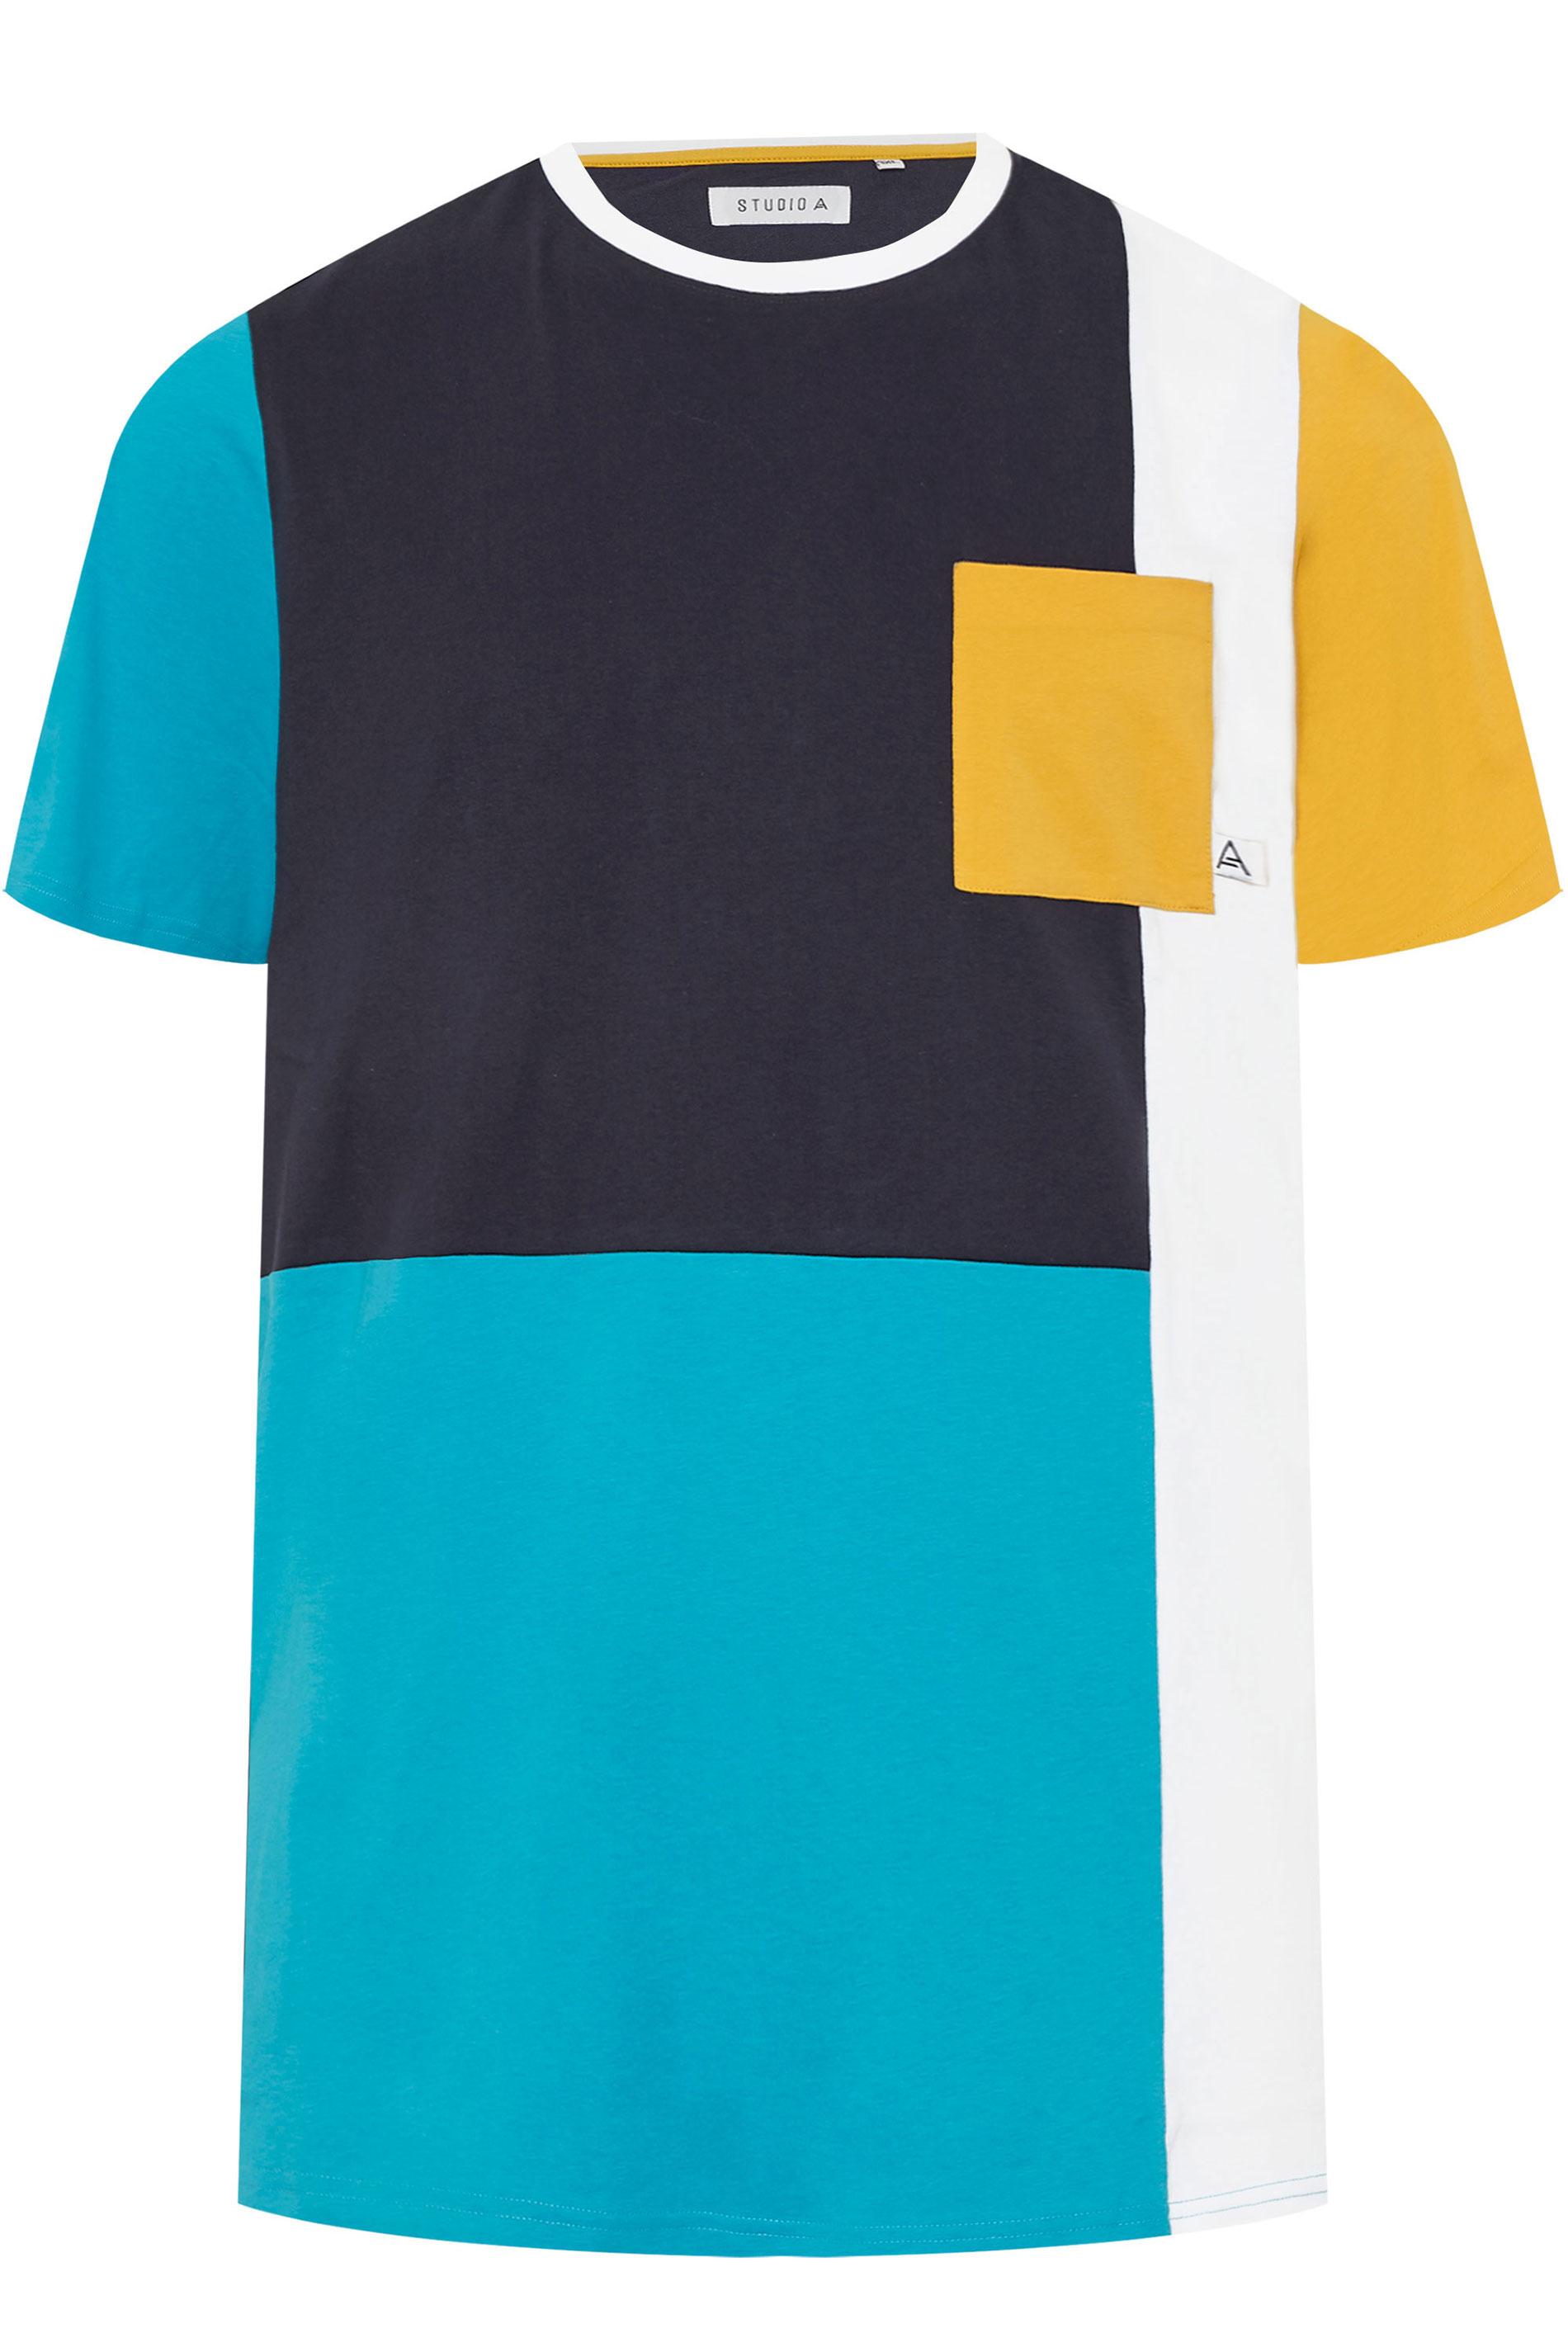 STUDIO A Multi Colour Block T-Shirt